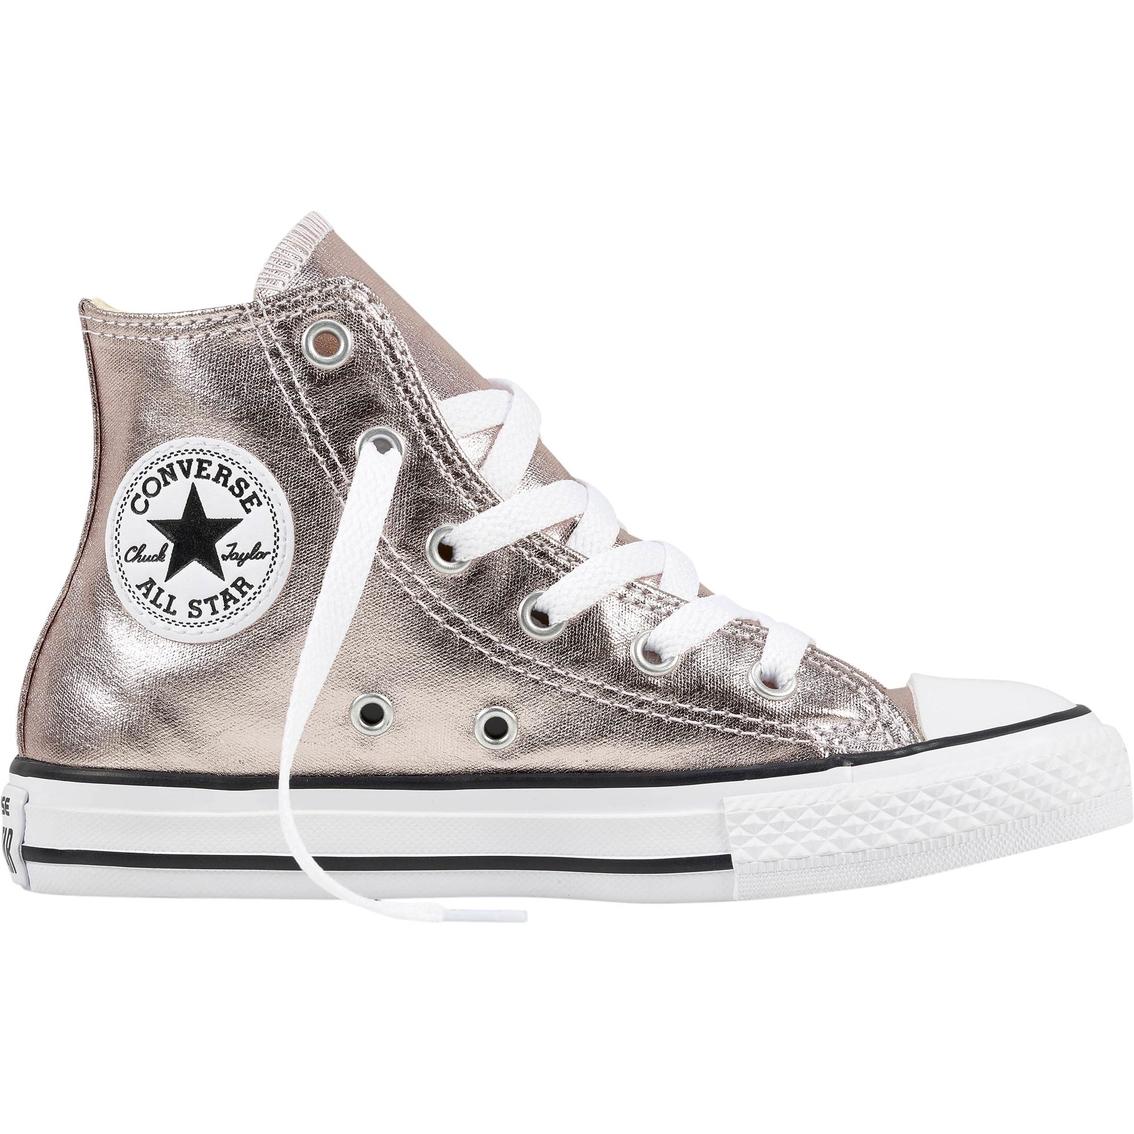 Converse Chuck Taylor All Star Girls Hi